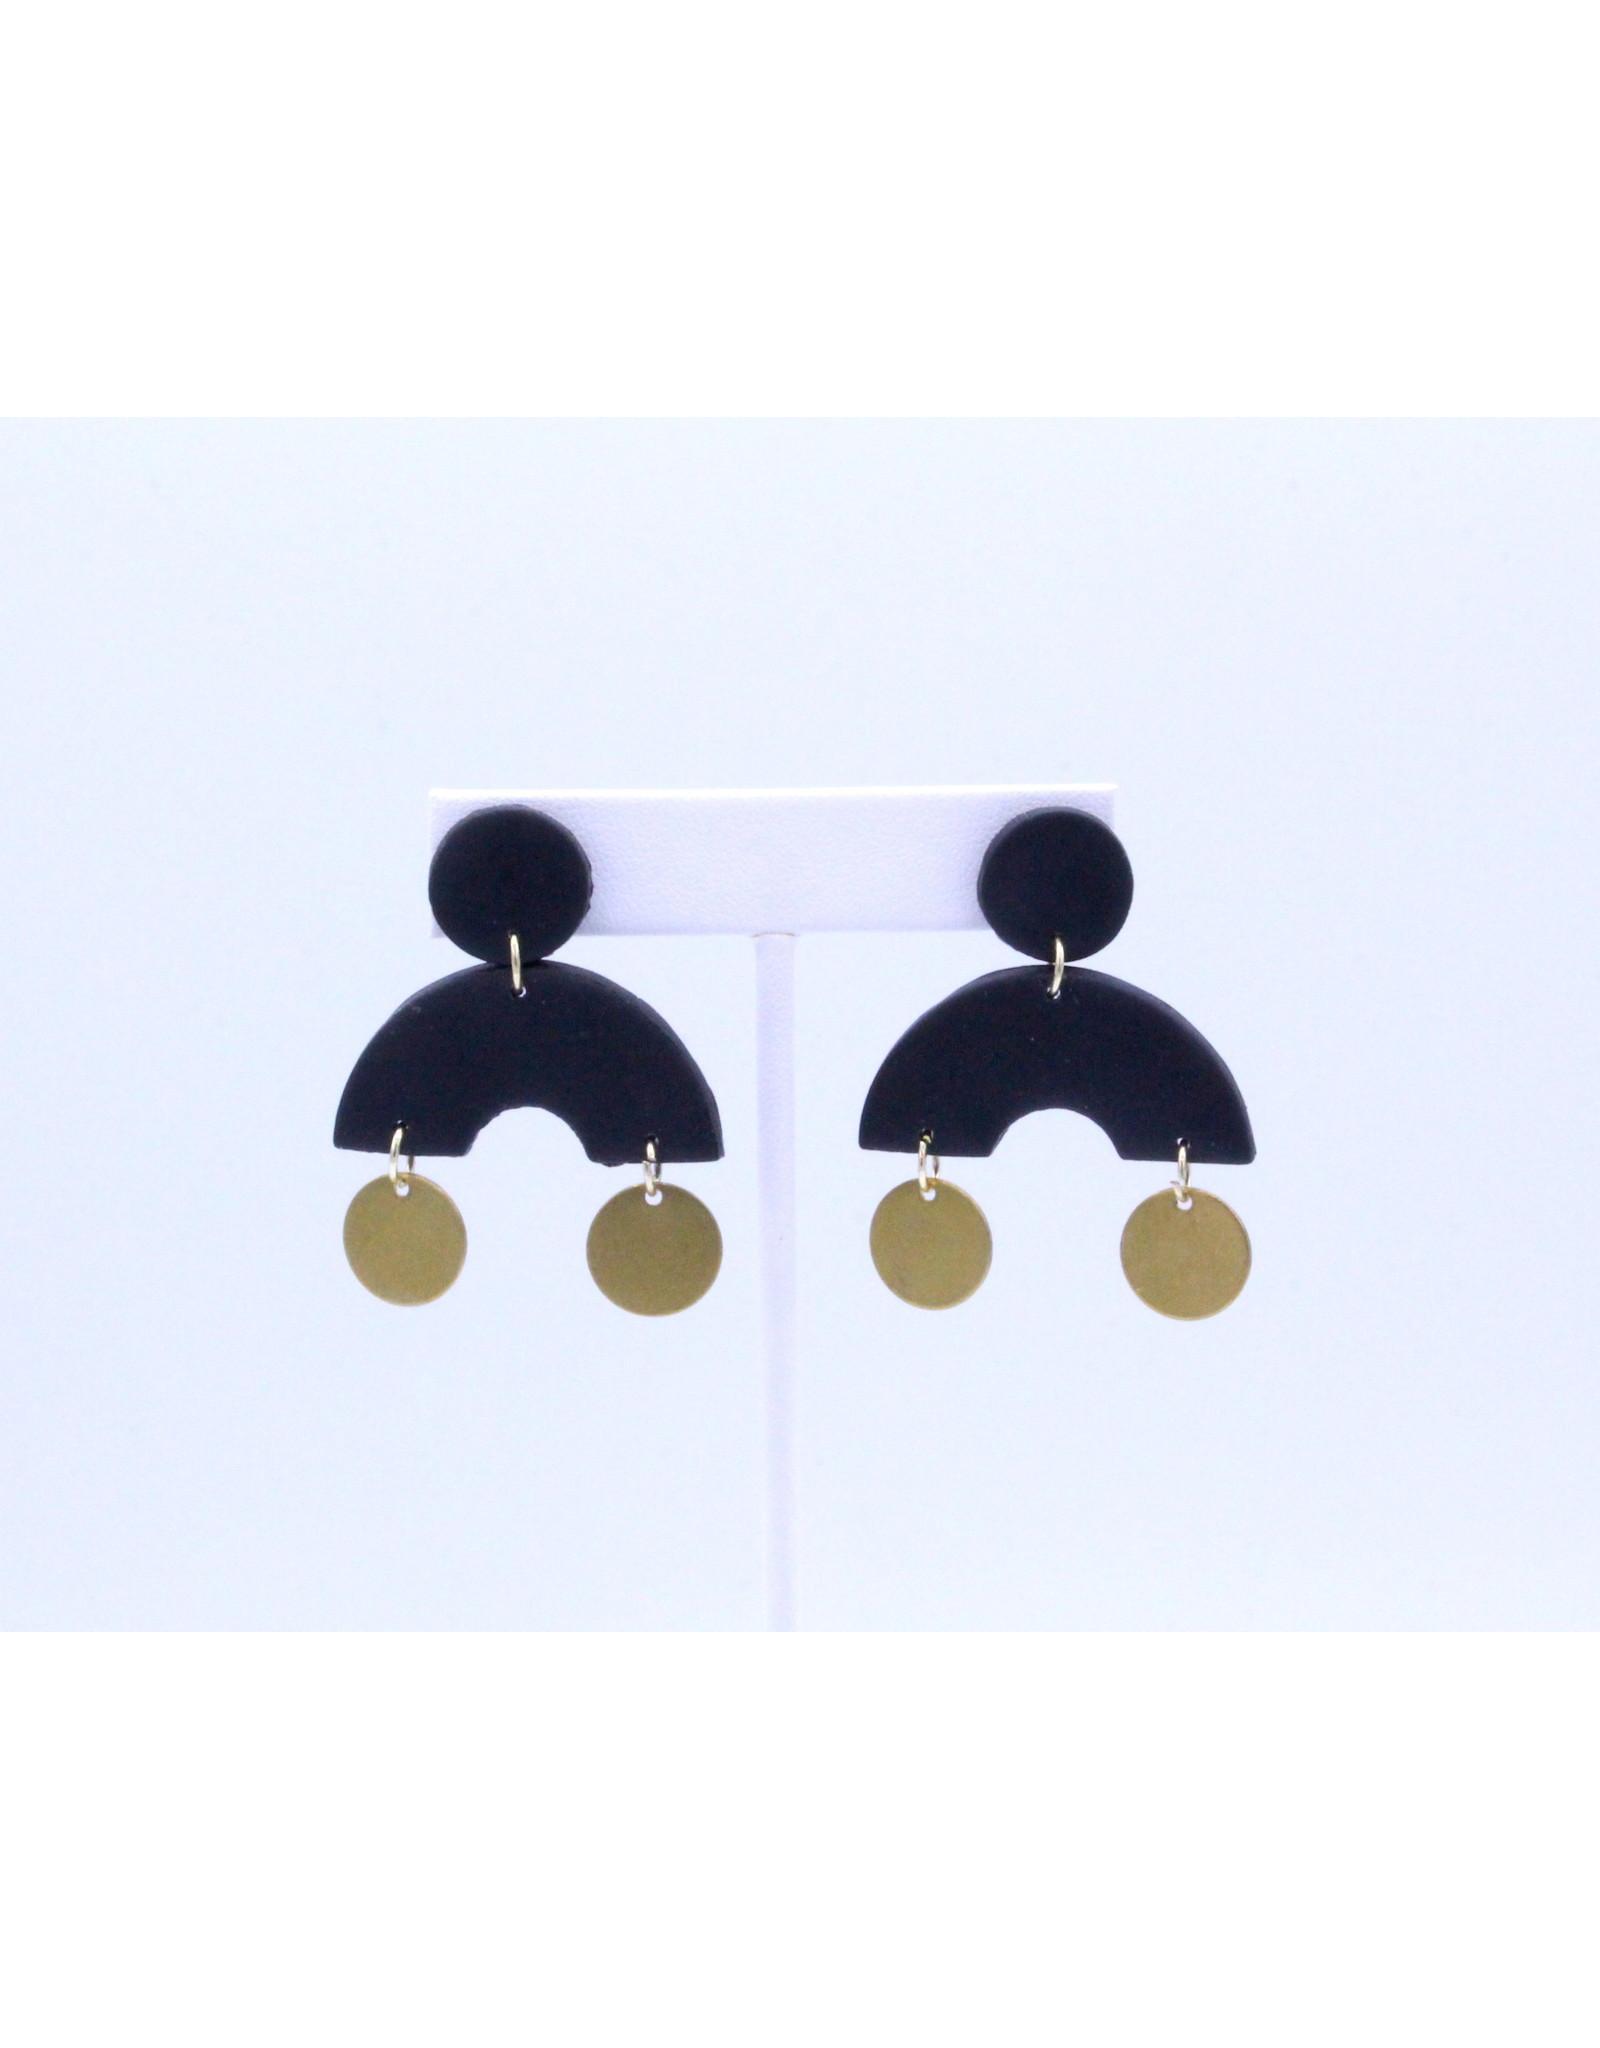 Arizona Earrings  - Black